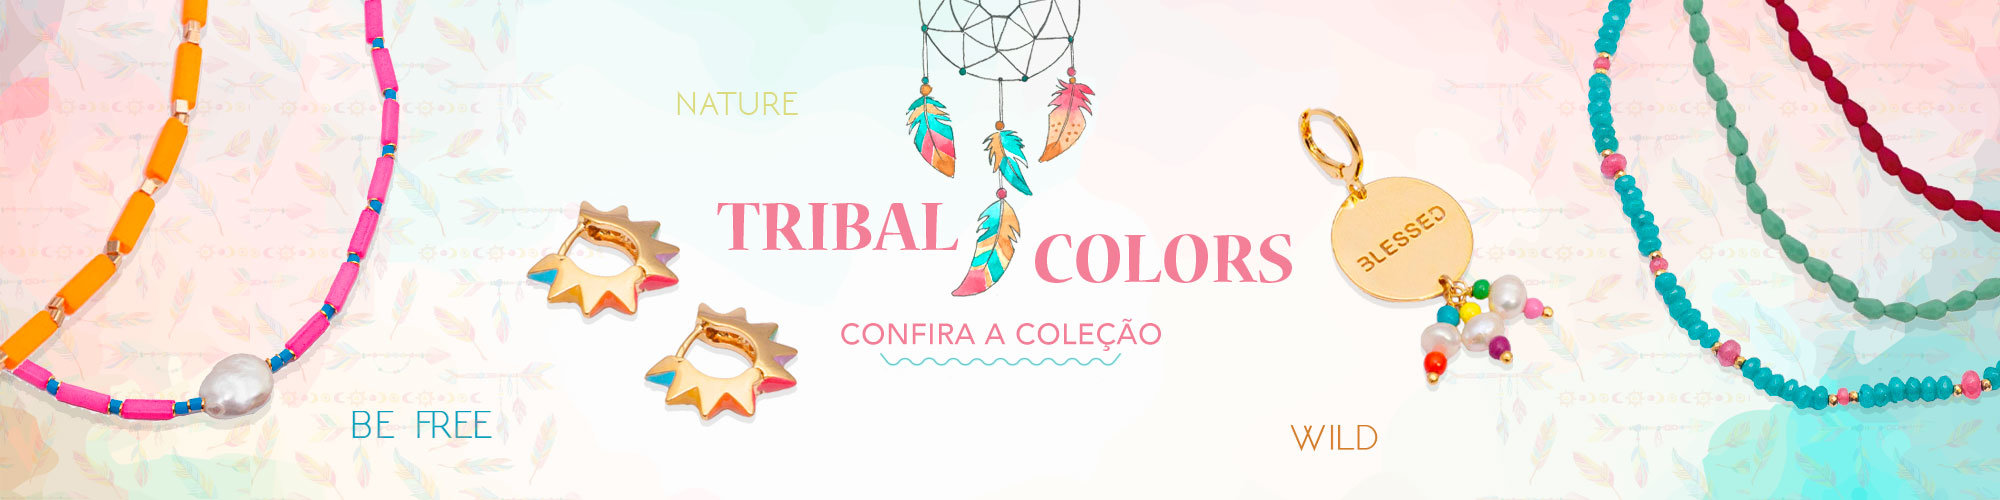 tribo colors